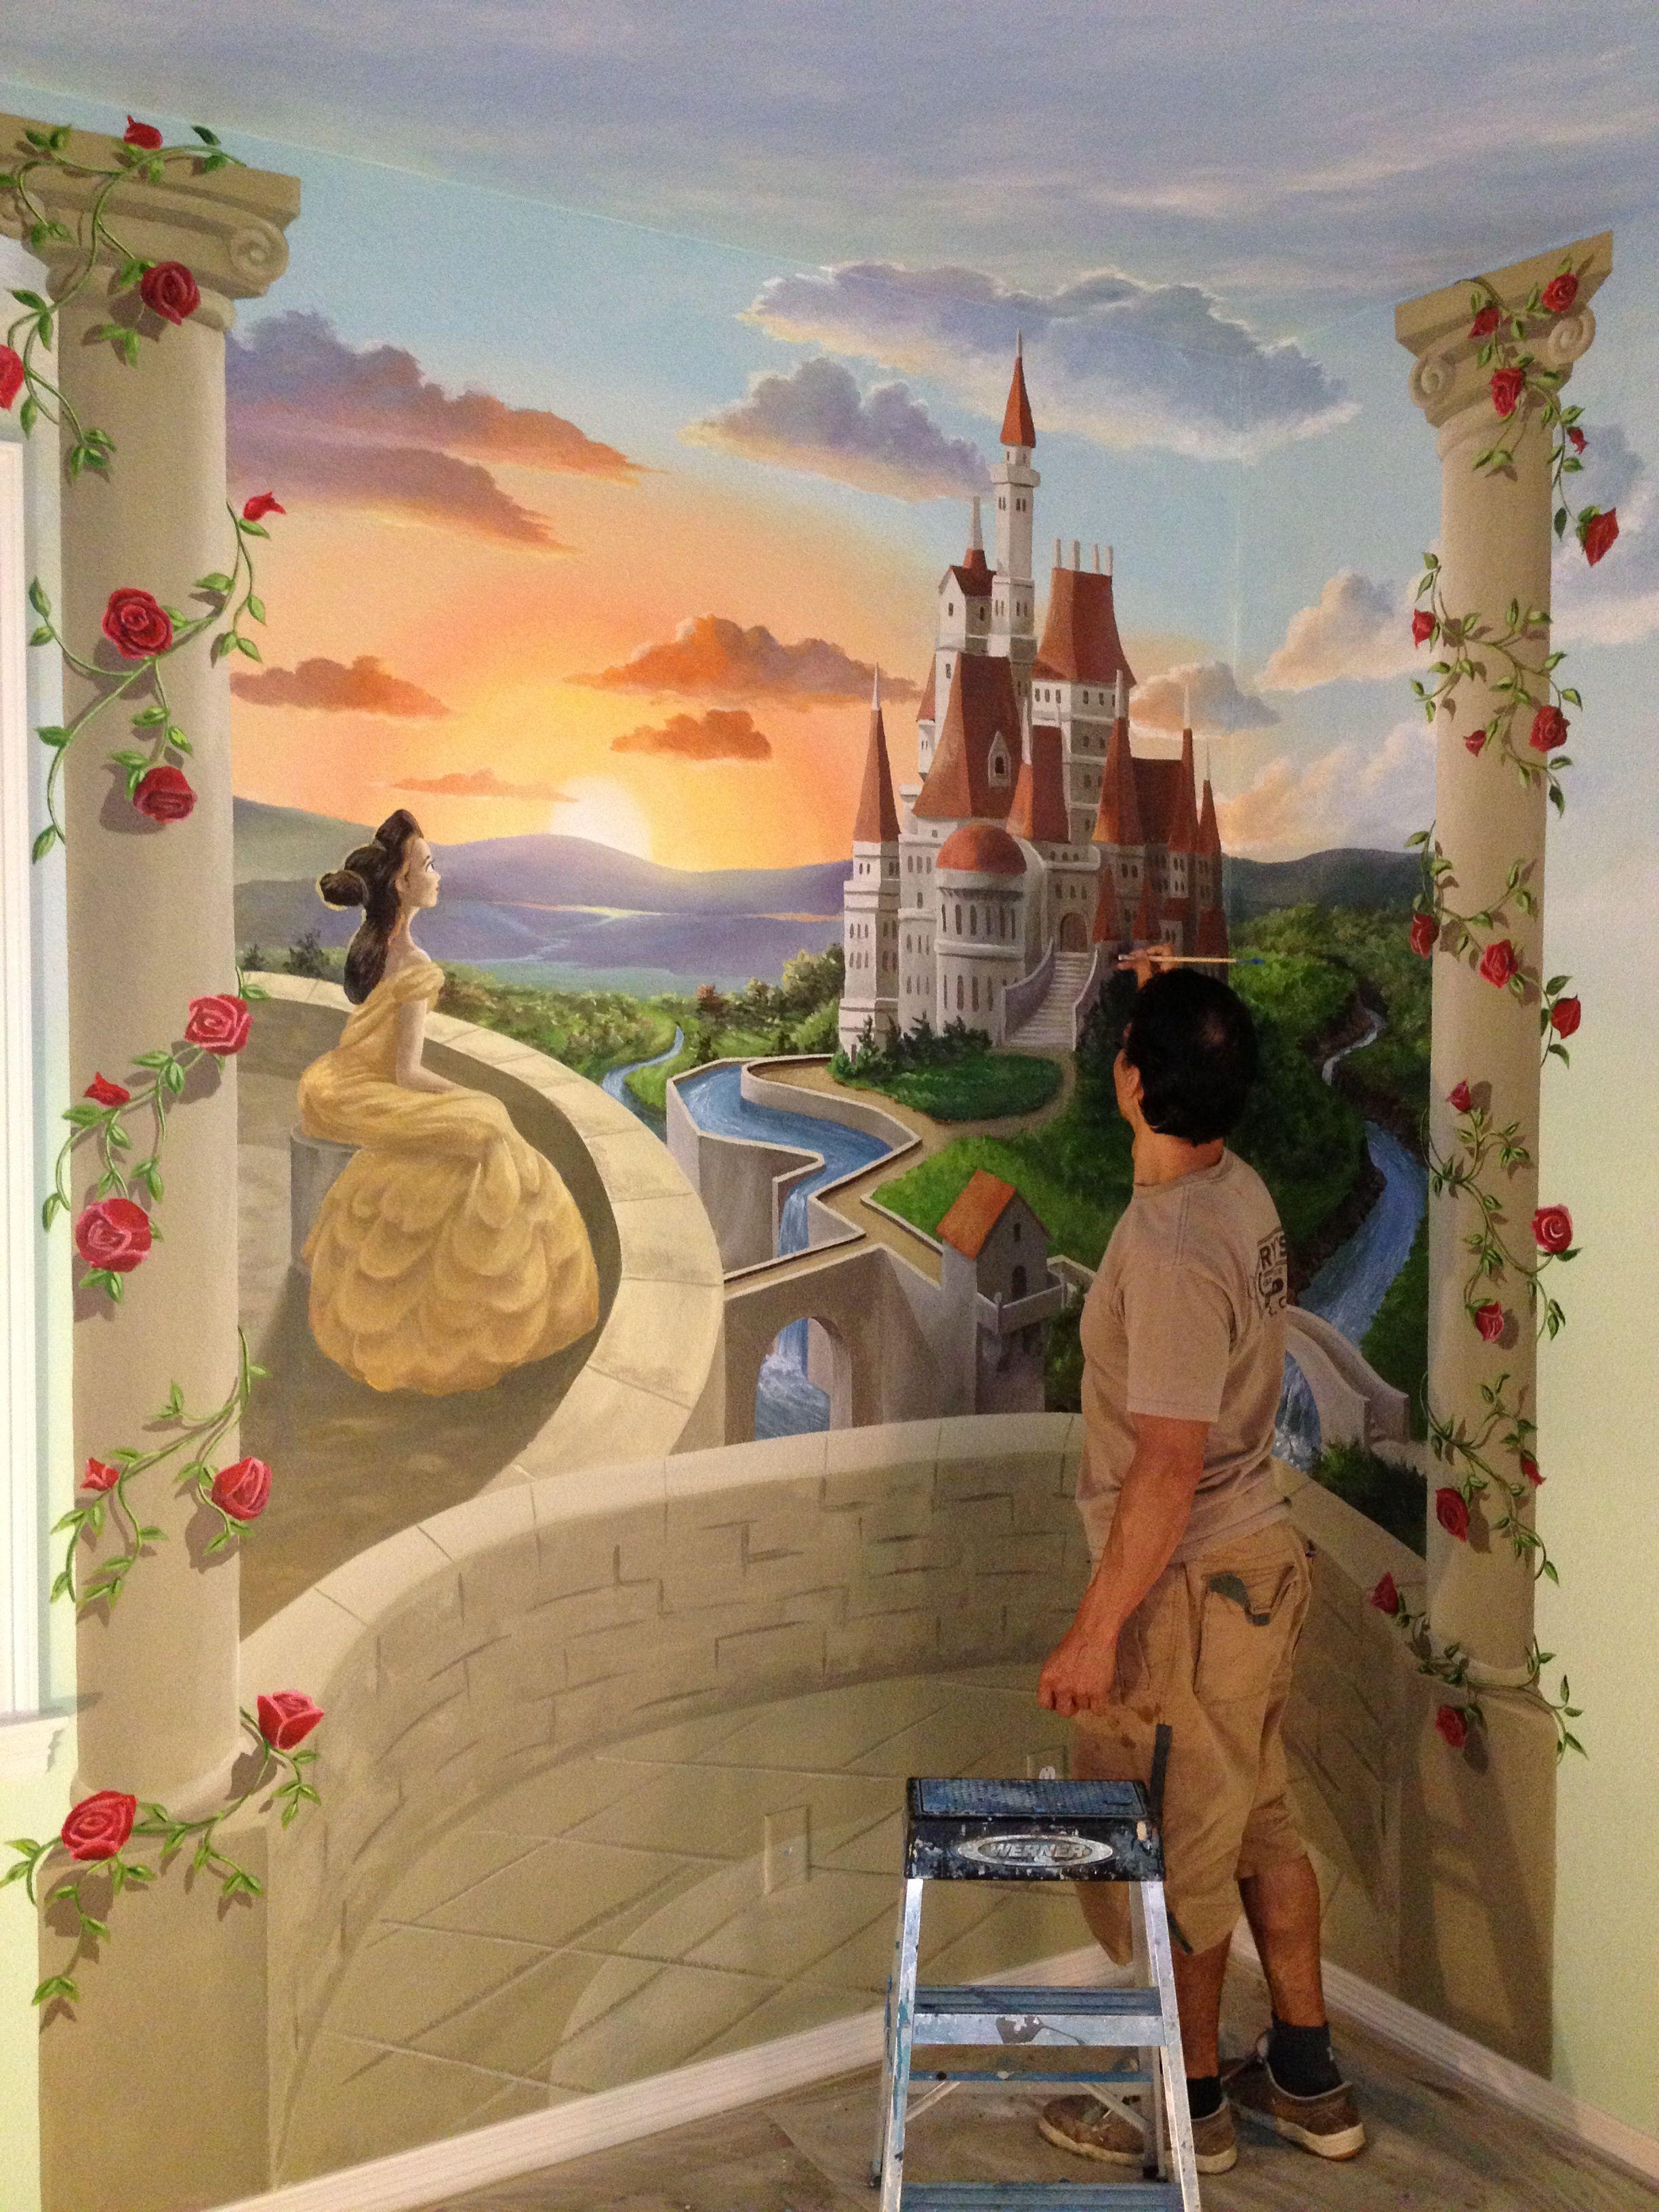 Best 50 Best Nursery Paint Ideas Ideas For The Girls Room 400 x 300